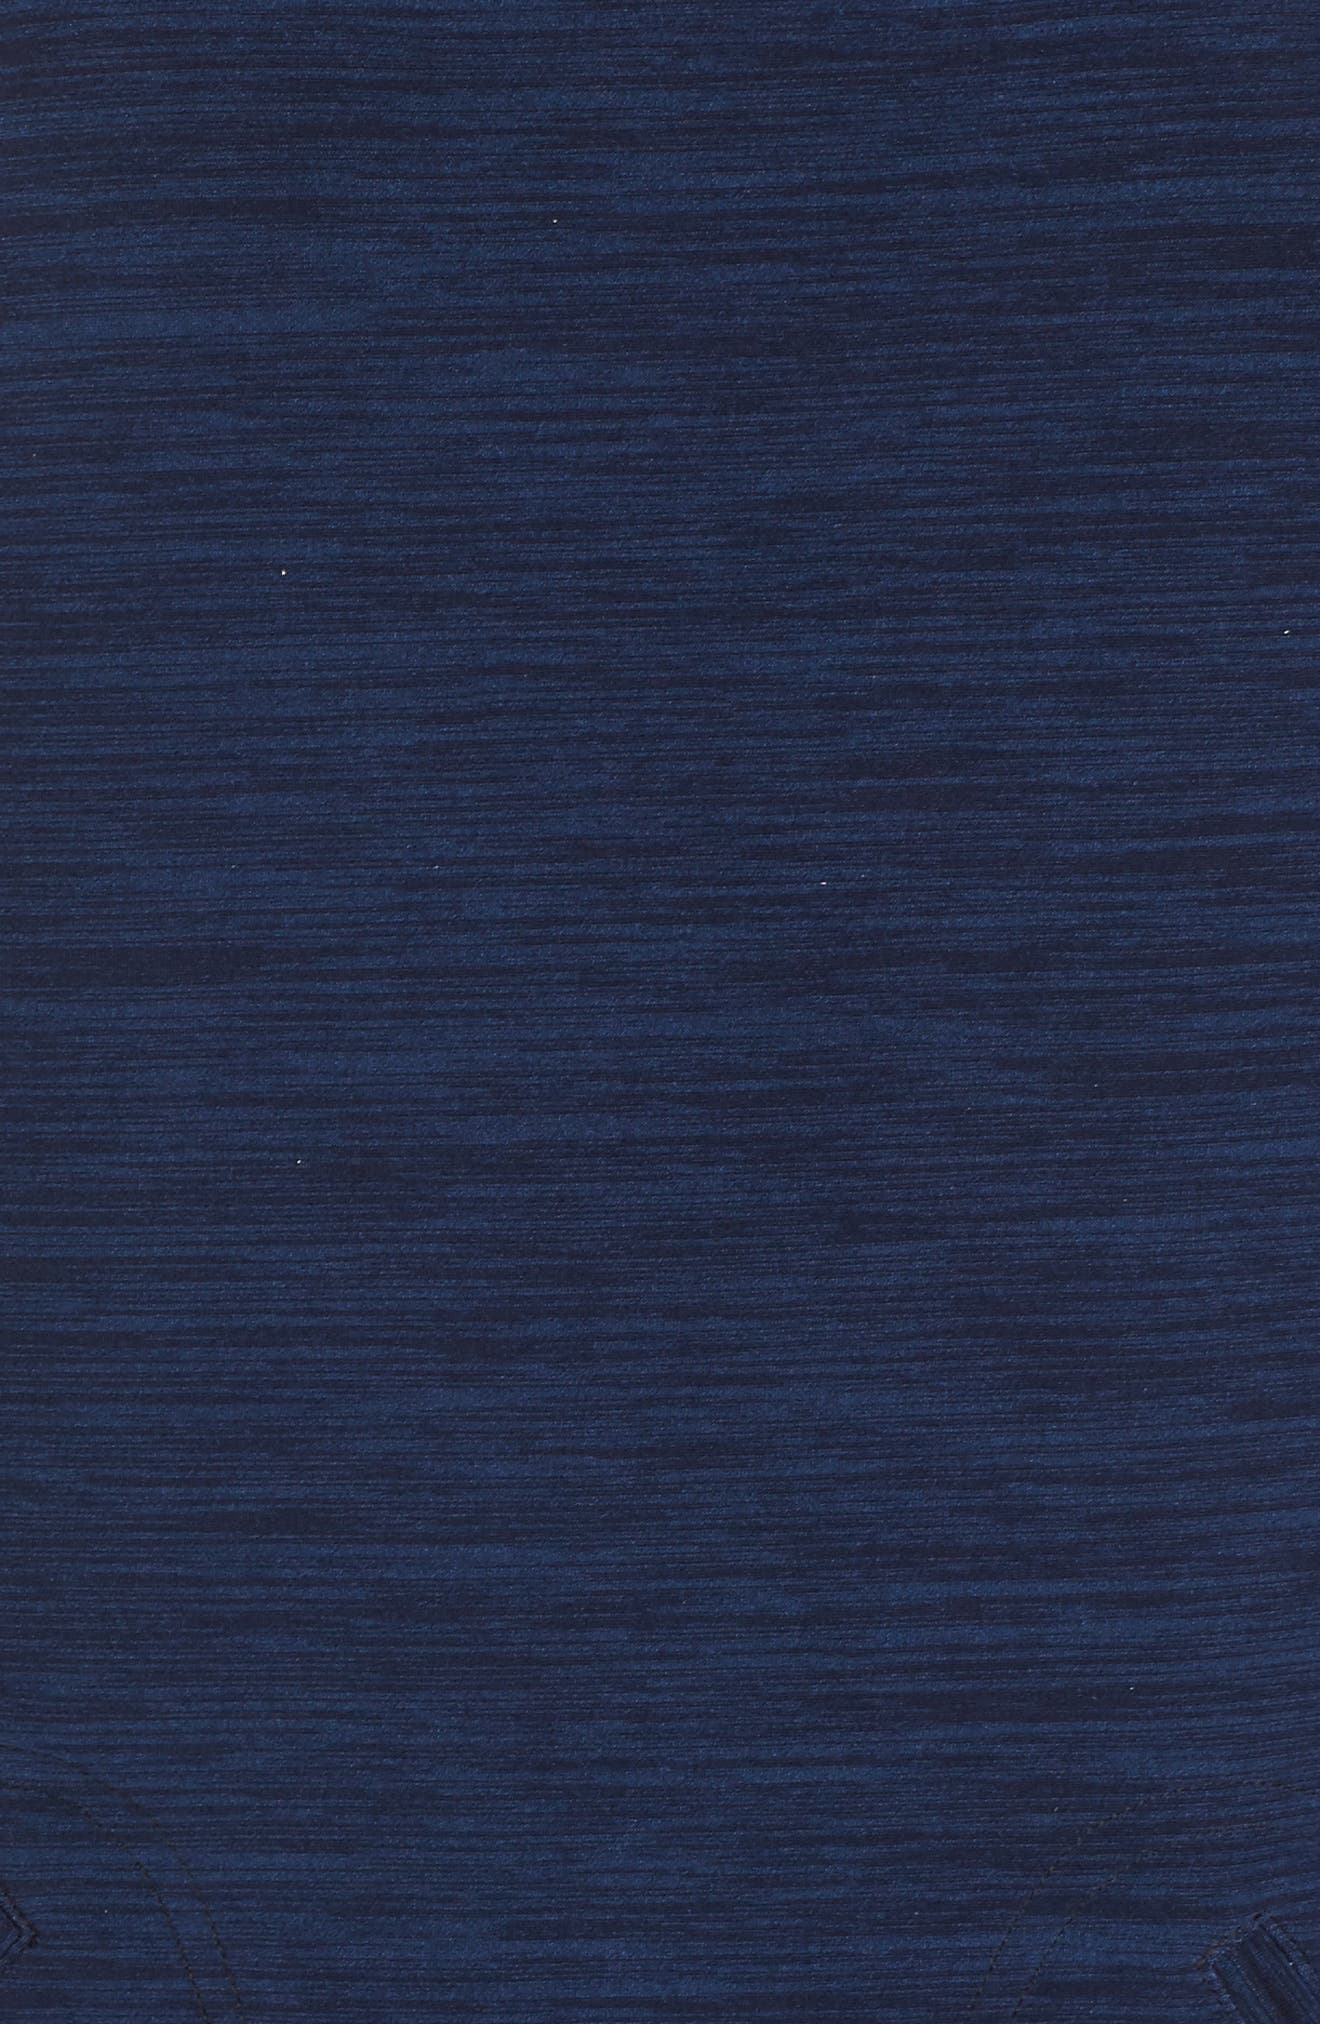 Turtleneck Shift Dress,                             Alternate thumbnail 6, color,                             Black Navy